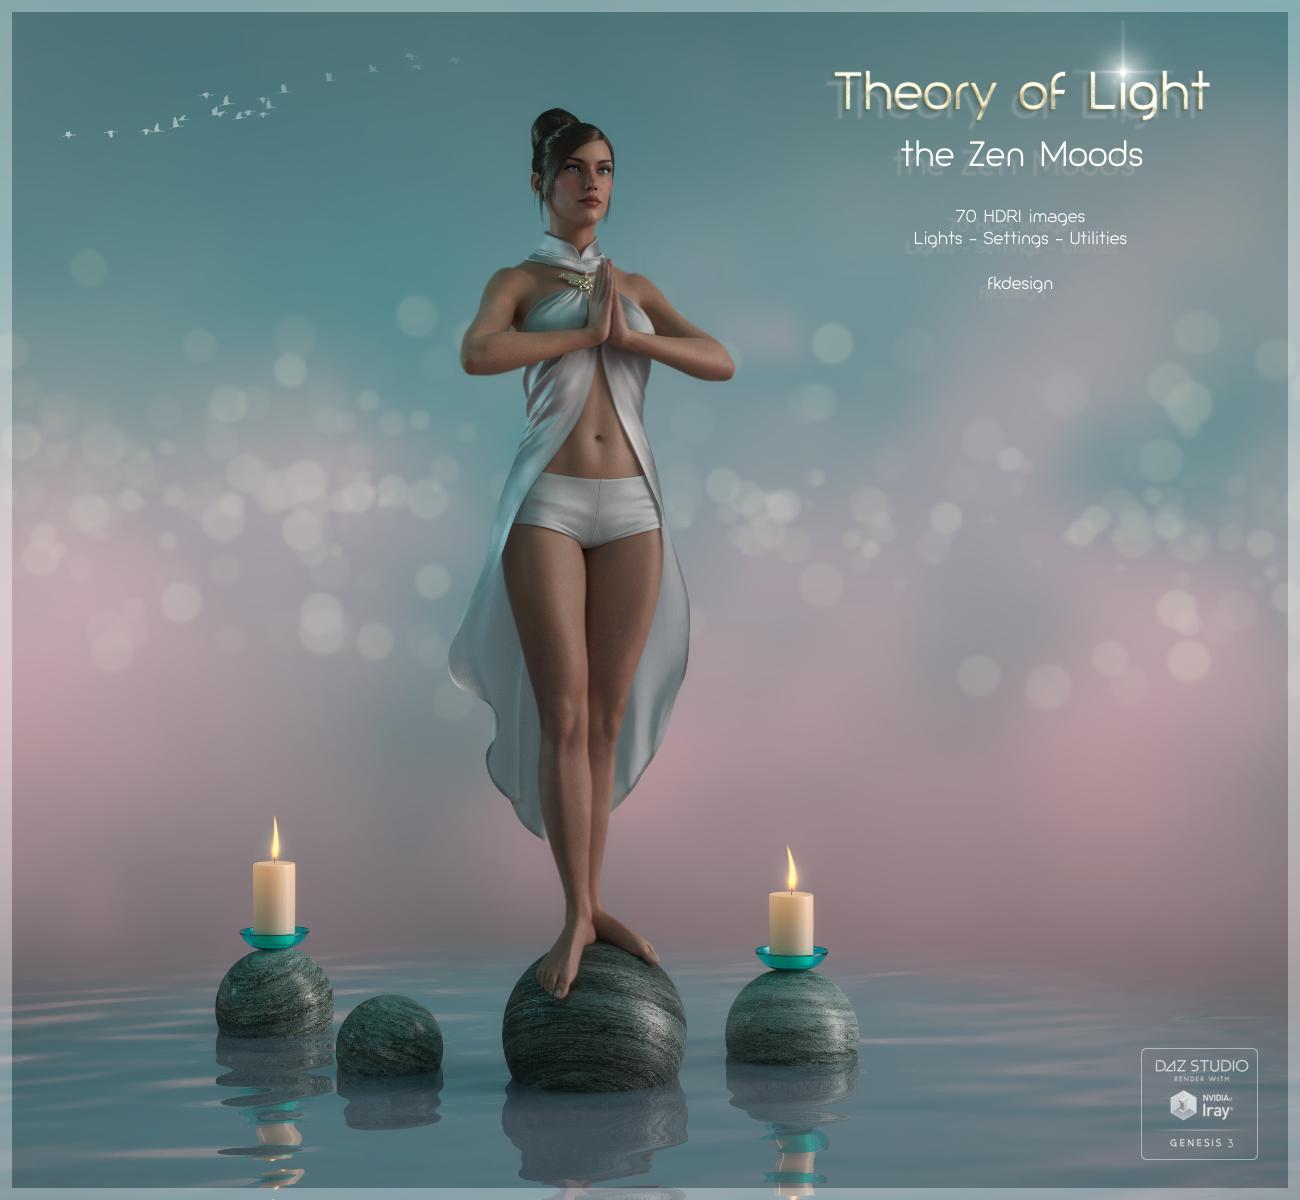 theory-of-light-–-zen-moods-iray-lights-and-hdris